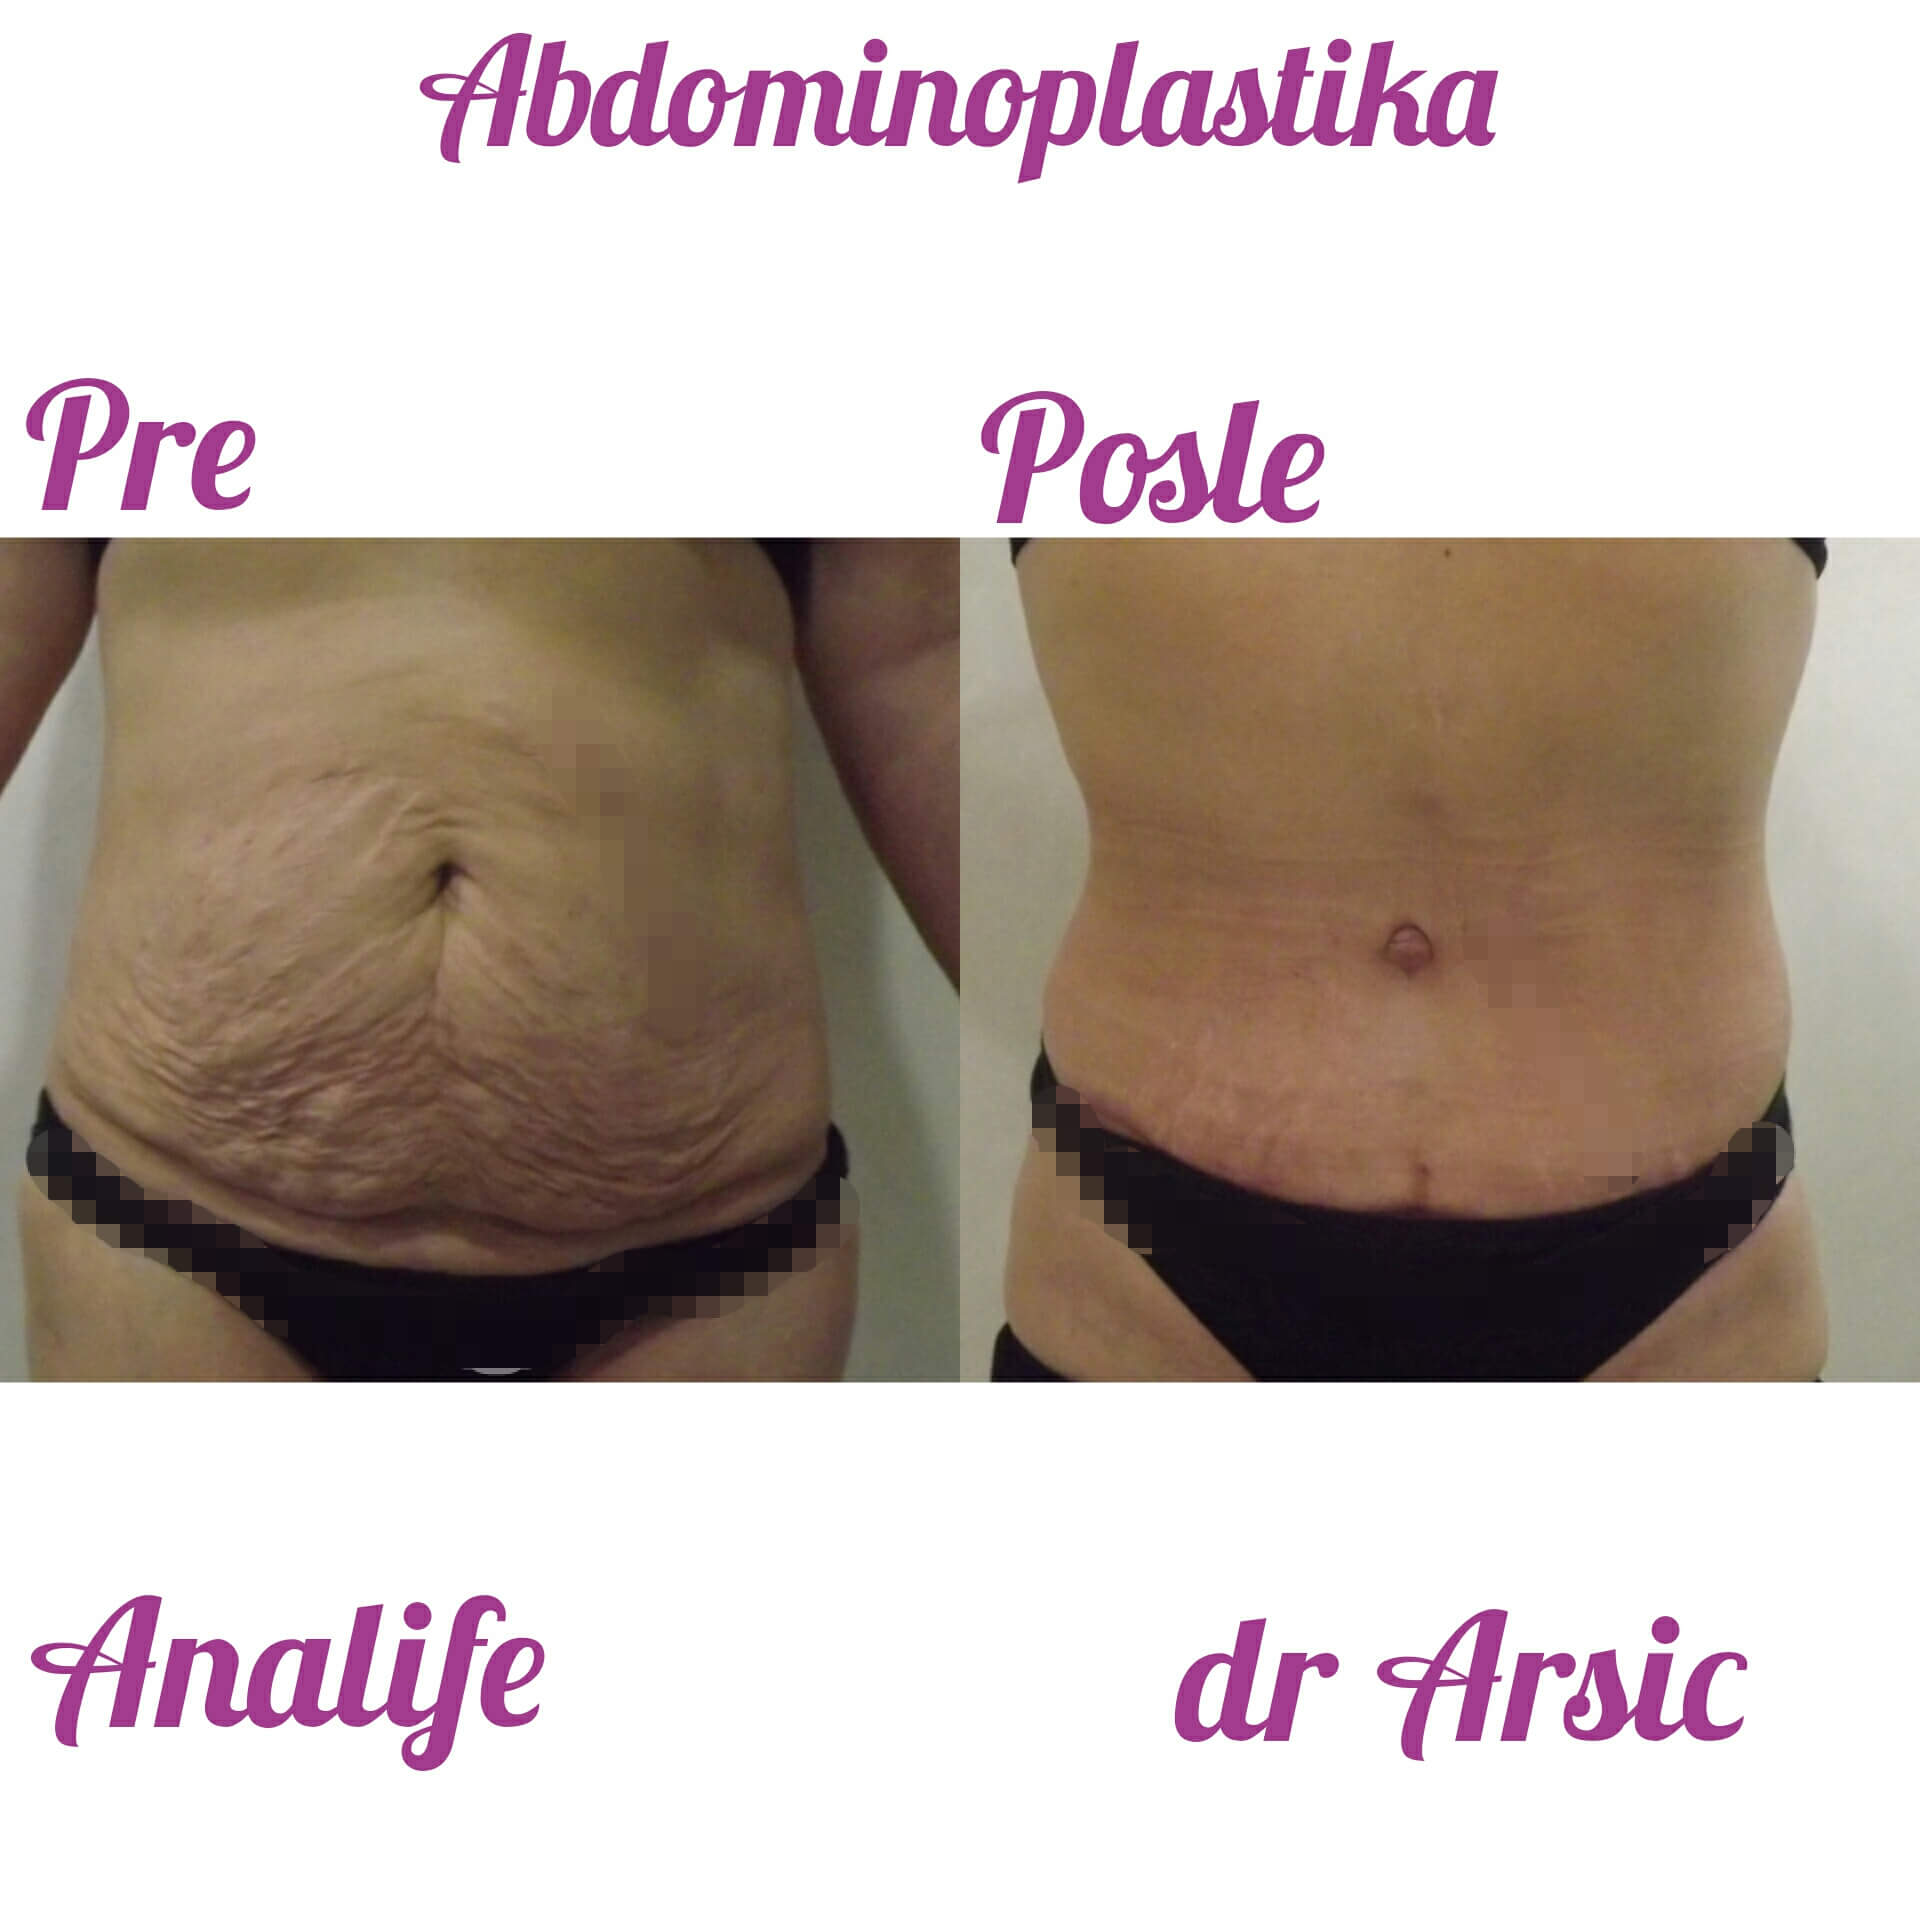 Dermolipektomija - abdominoplastika stomaka